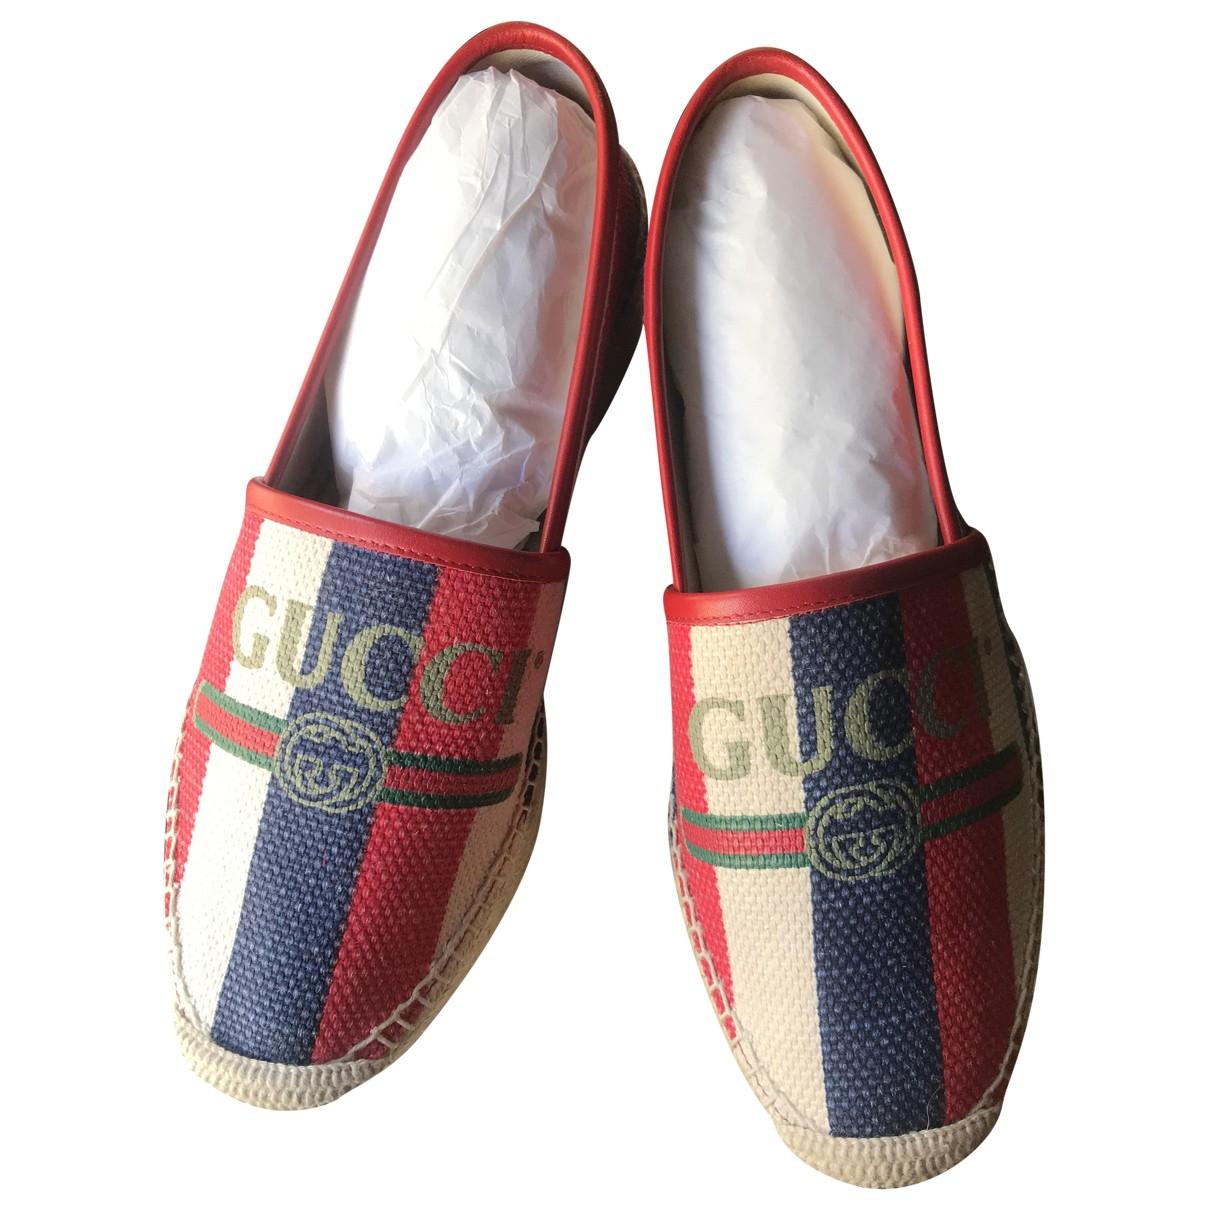 Gucci \N Multicolour Leather Espadrilles for Women 39.5 EU